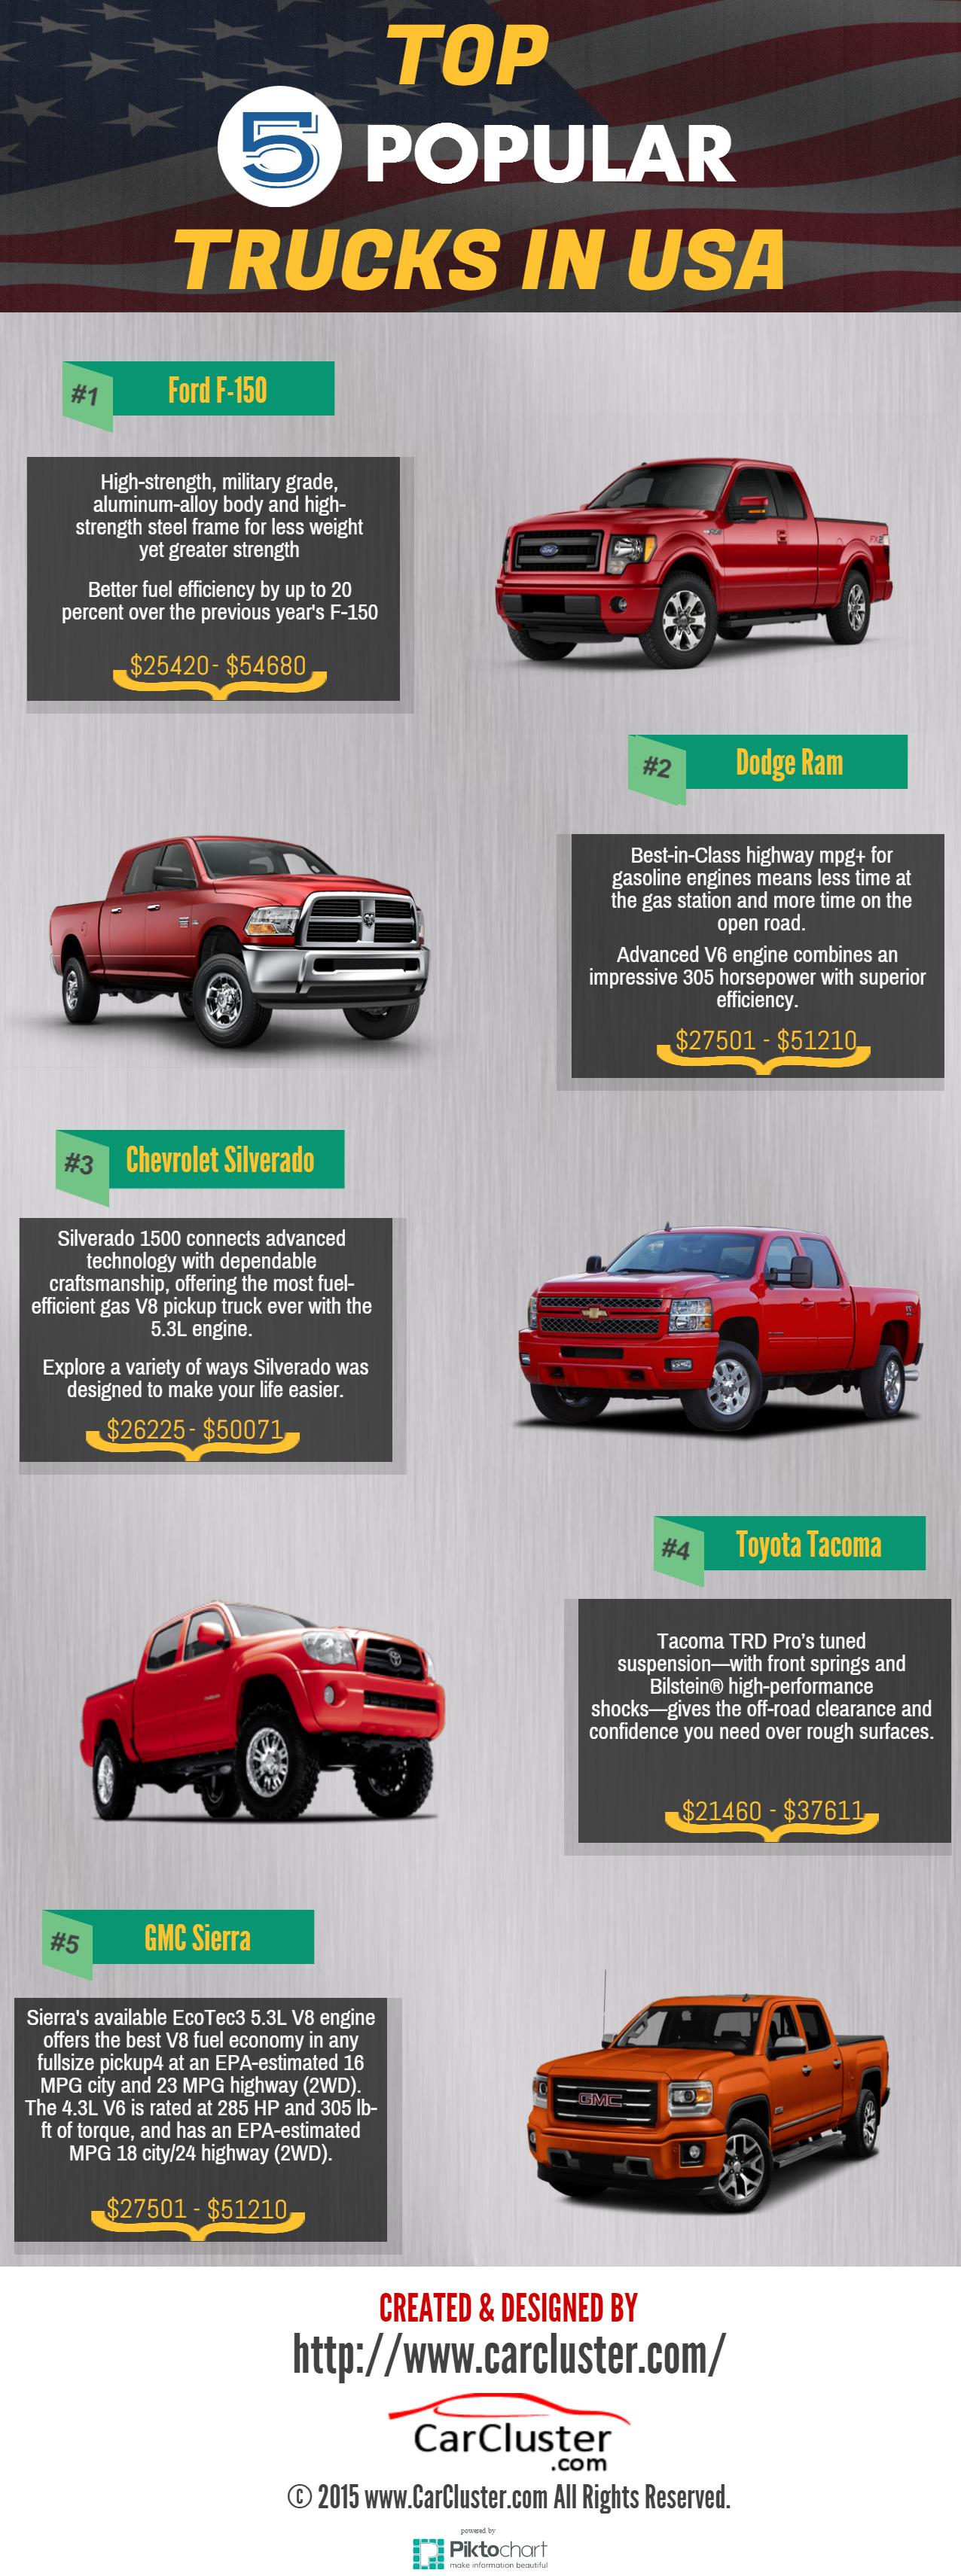 Top 5 Trucks in USA